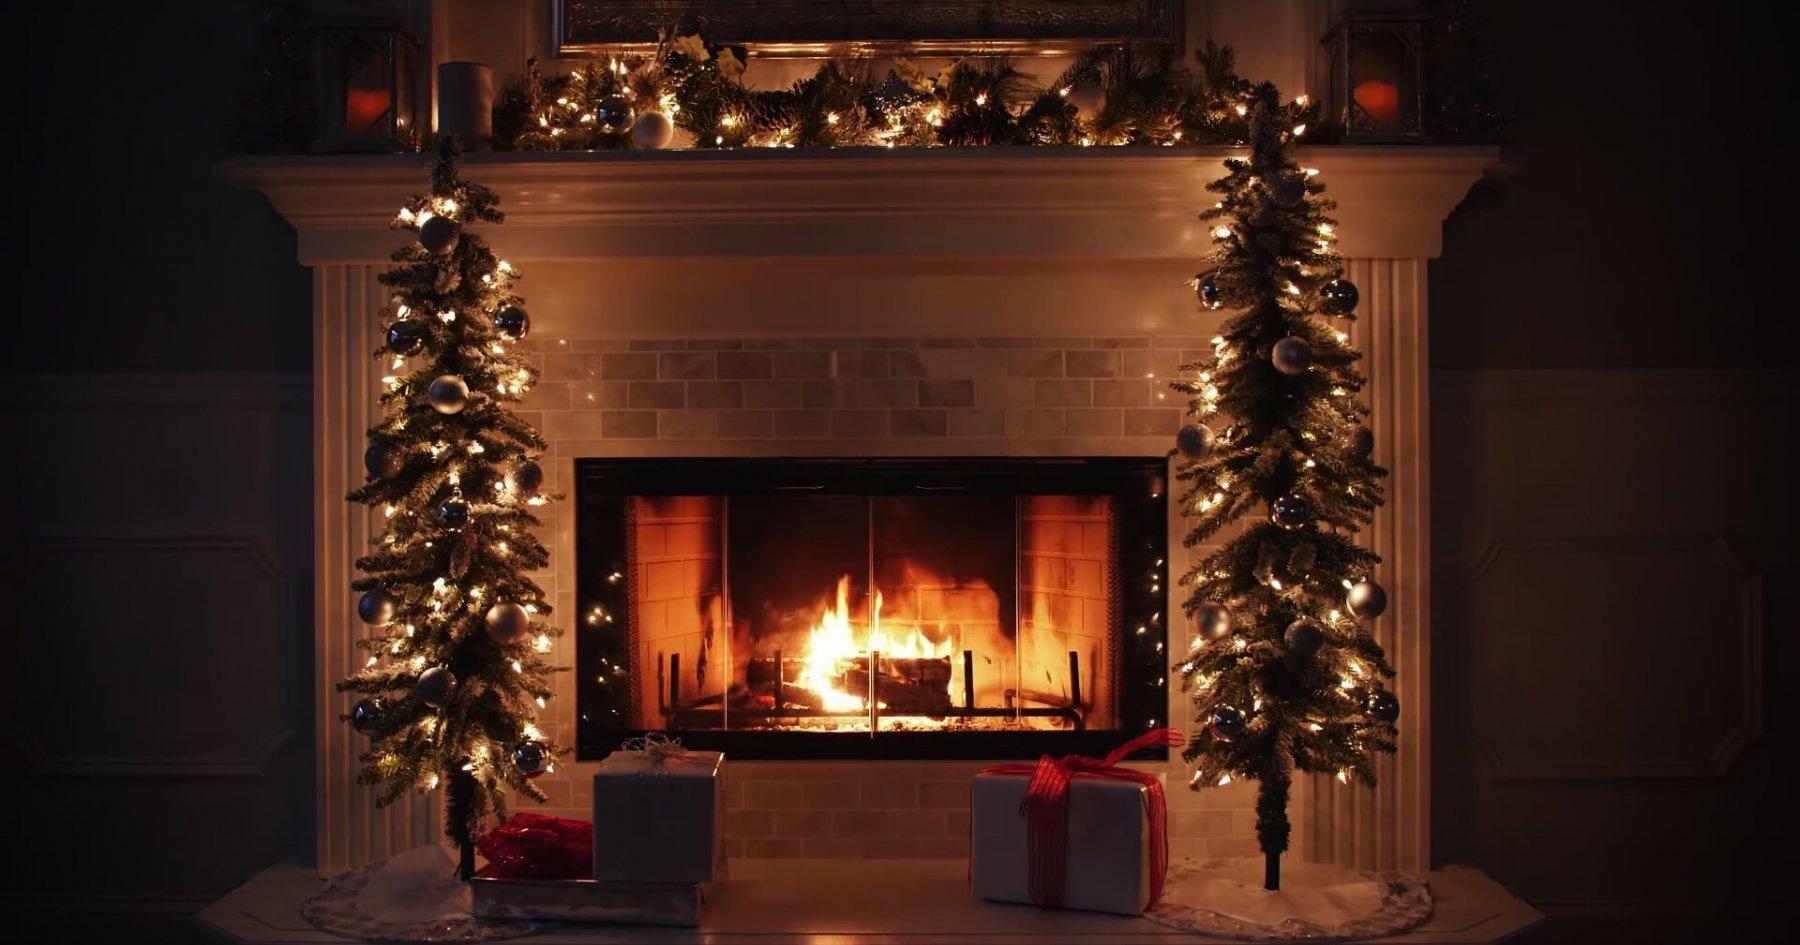 Pentatonix - Rockin Around The Christmas Tree | İzlesene.com